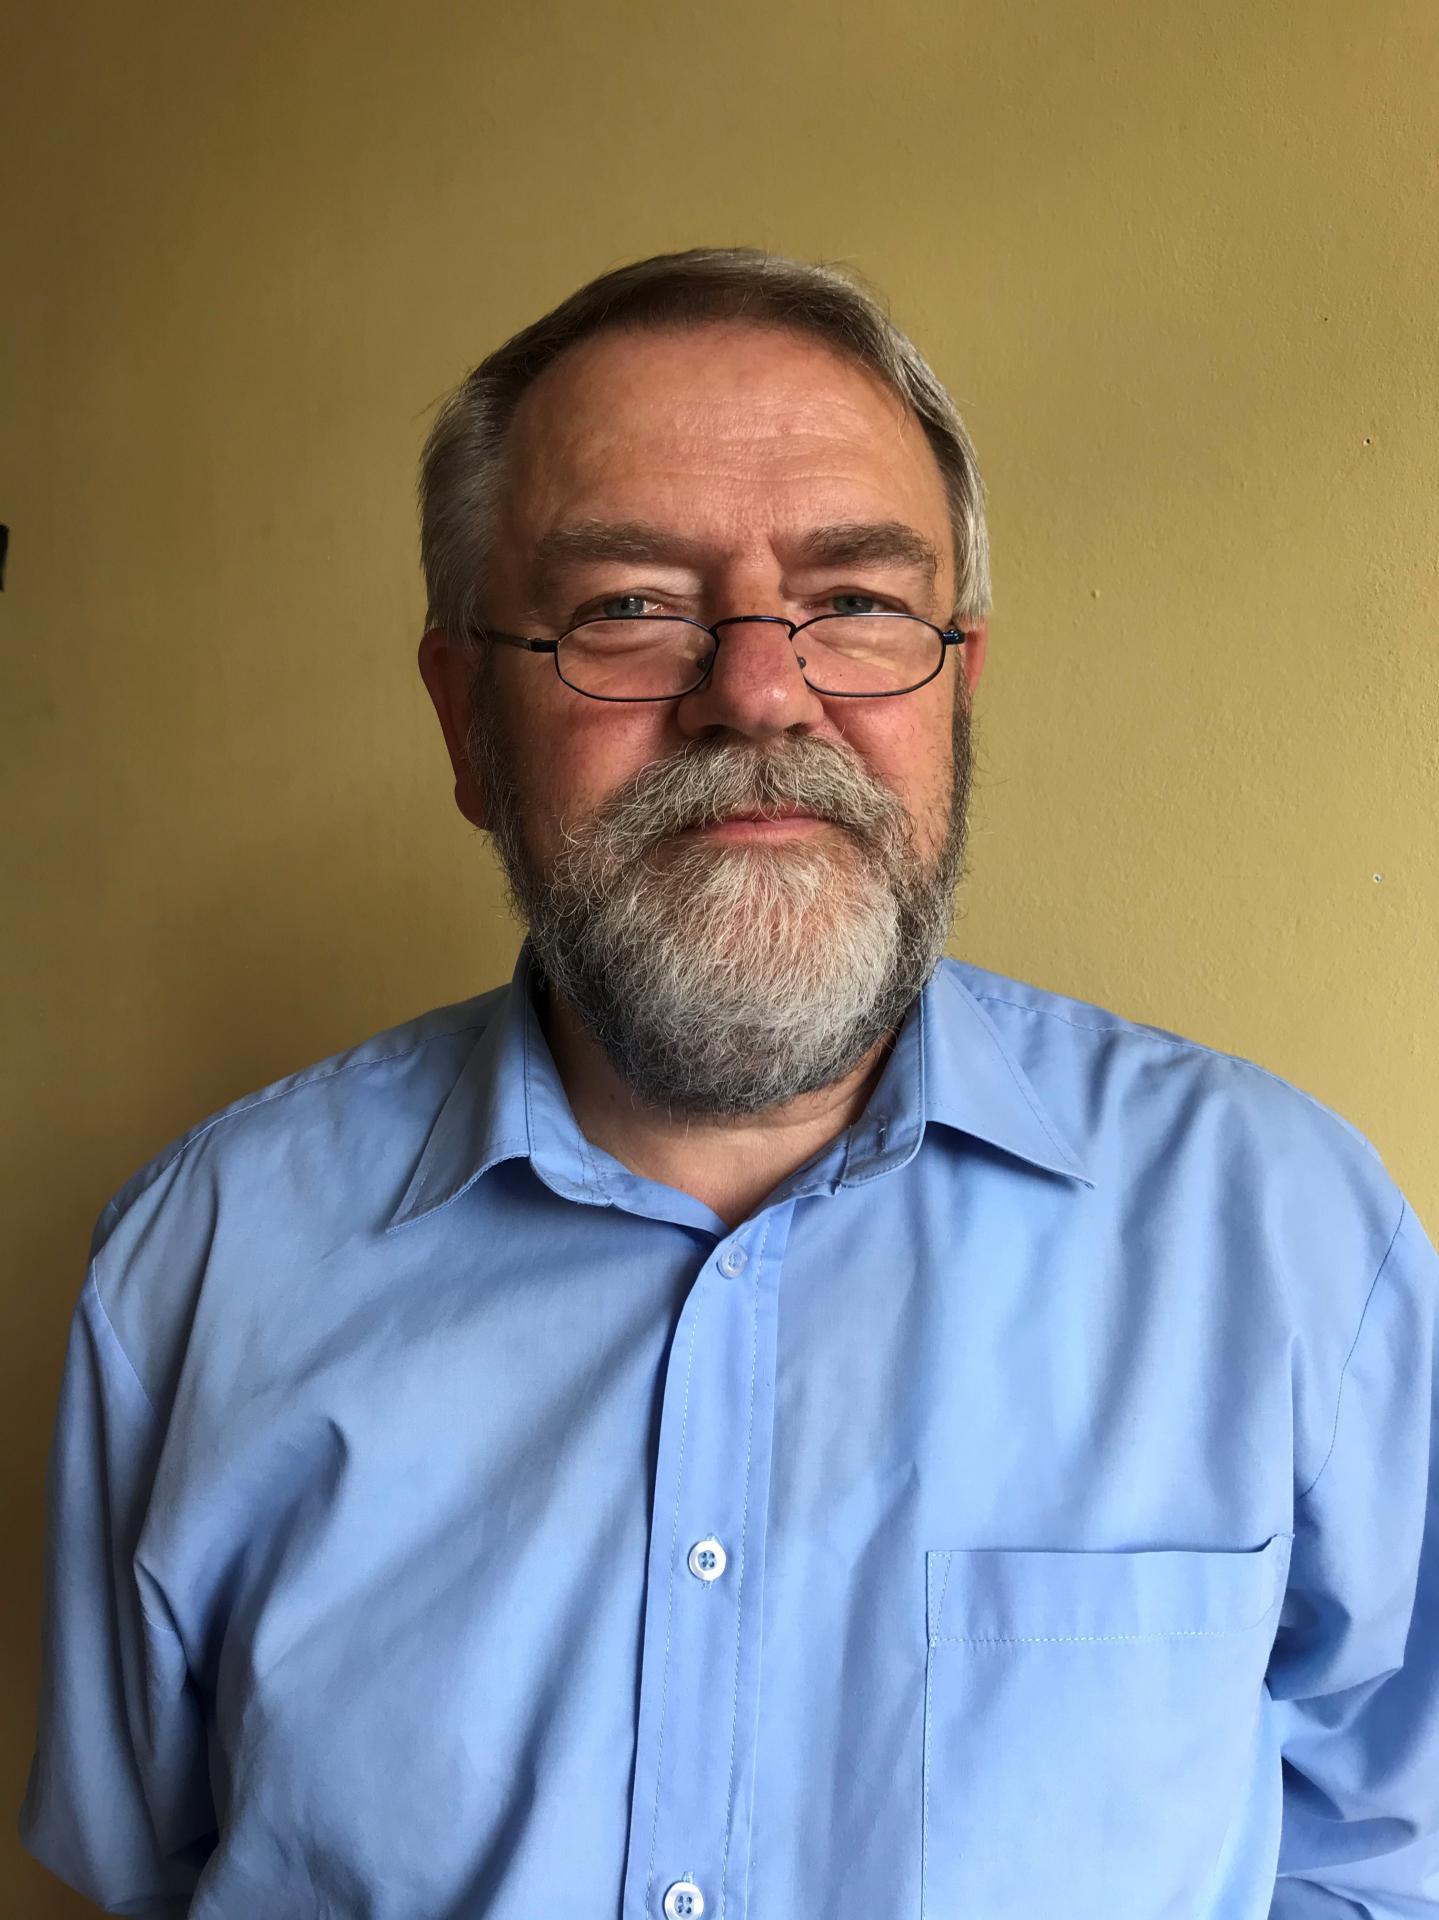 Raimar Hartig